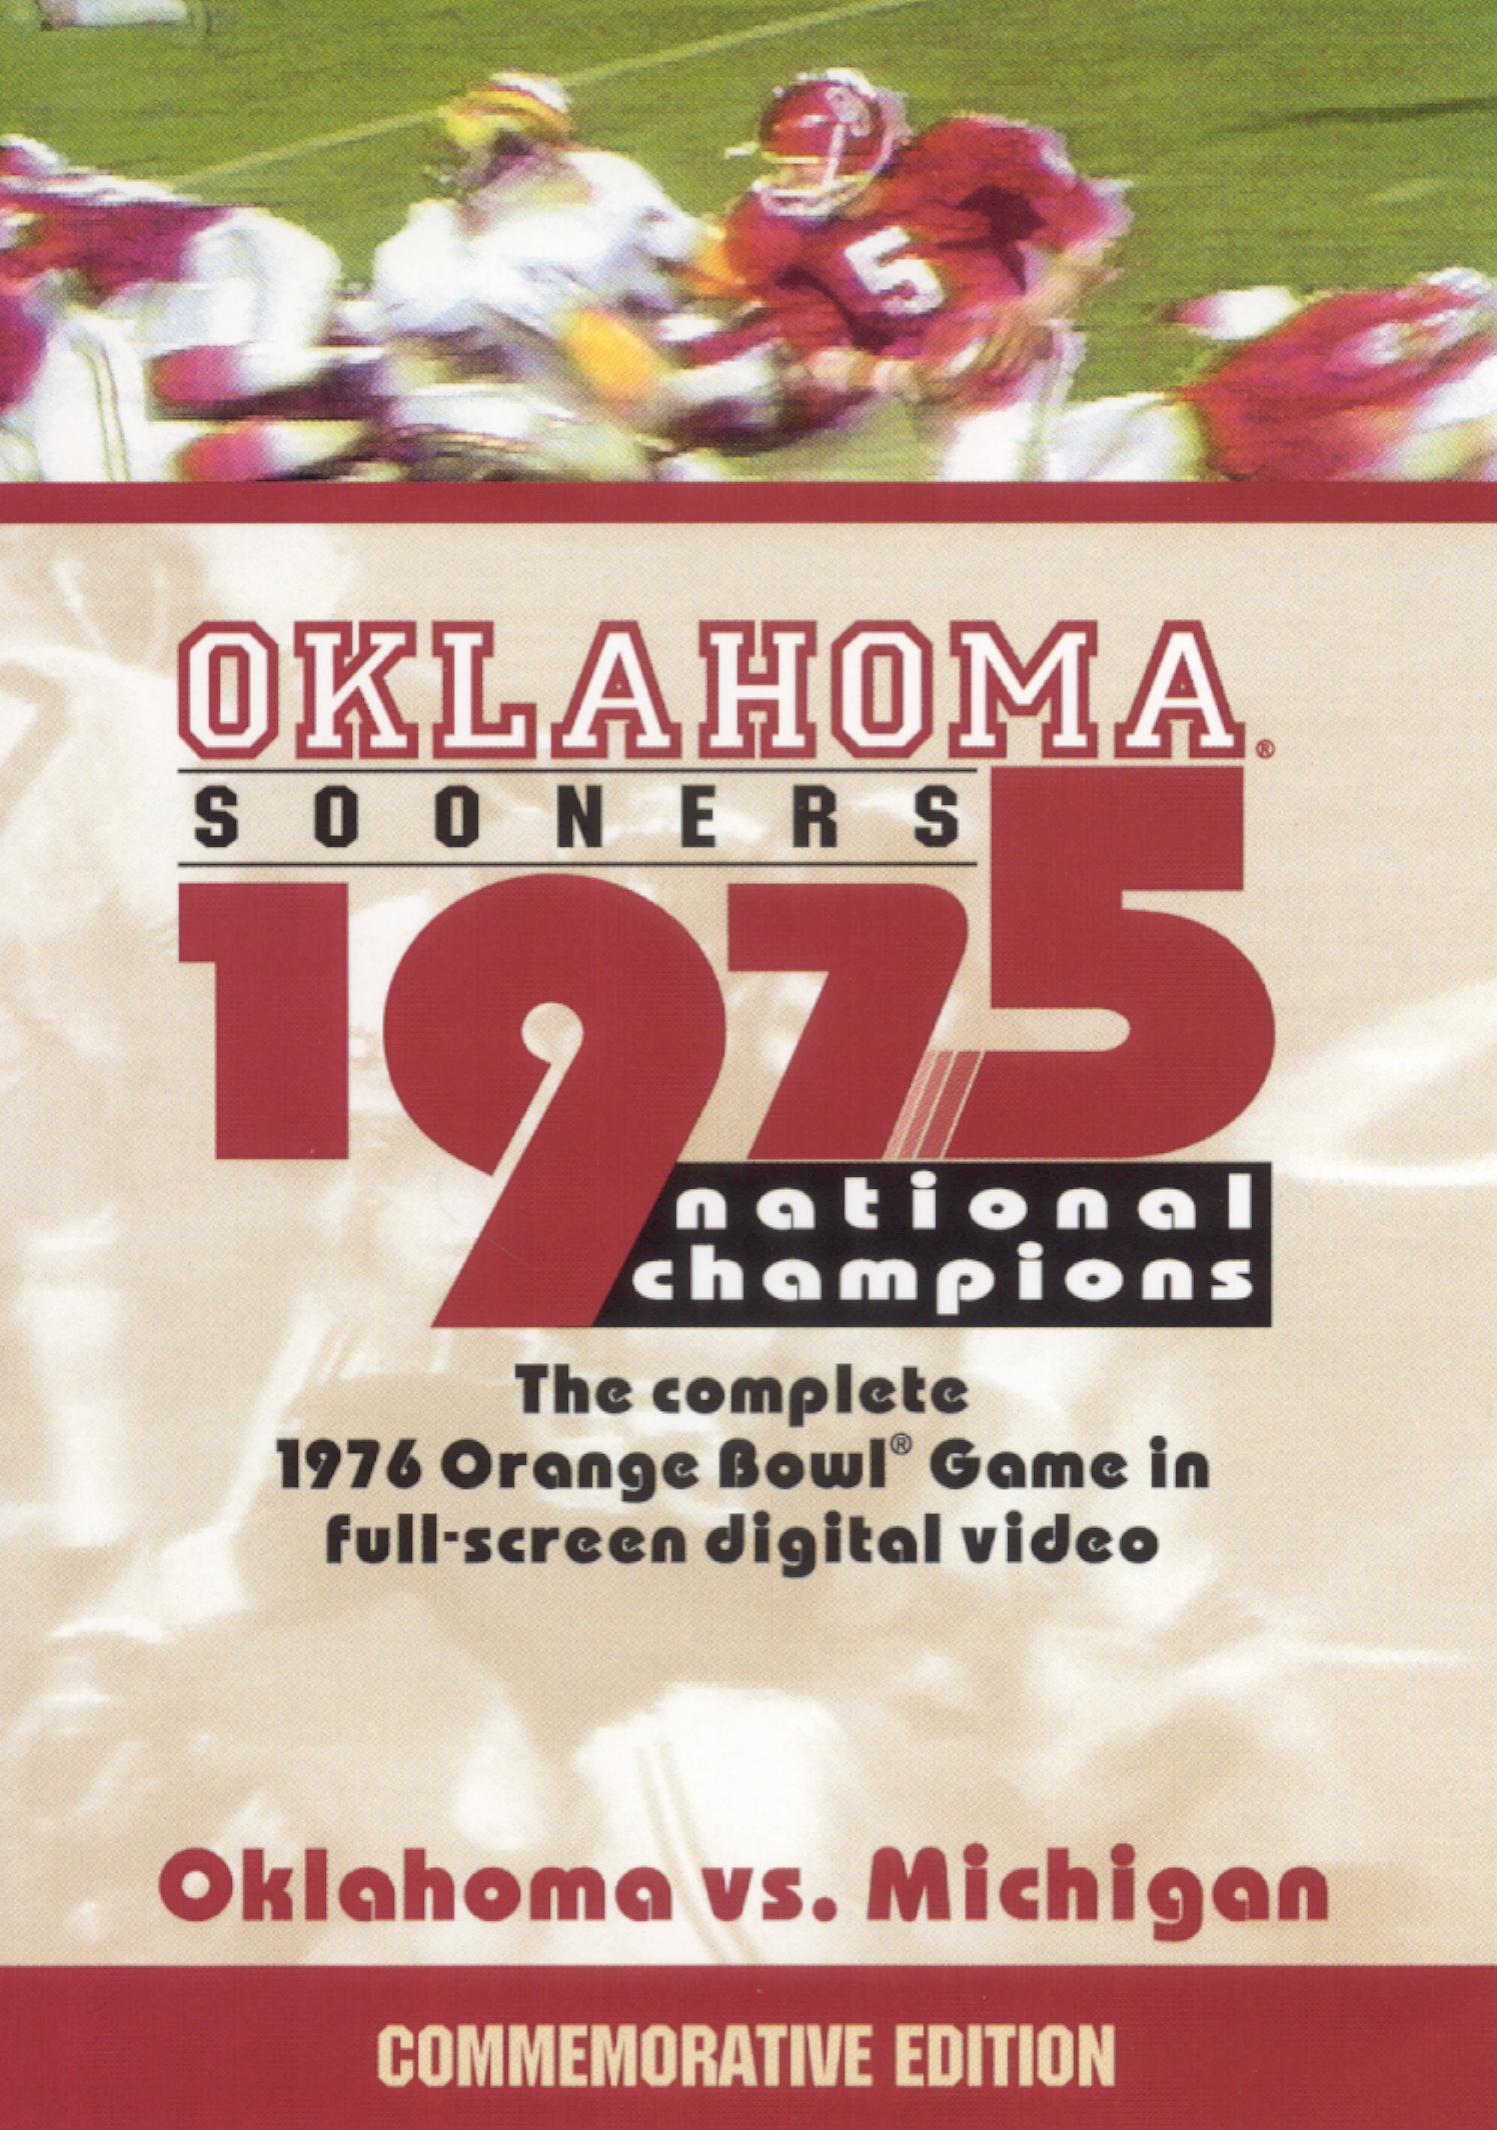 Oklahoma Sooners: 1975 National Champions